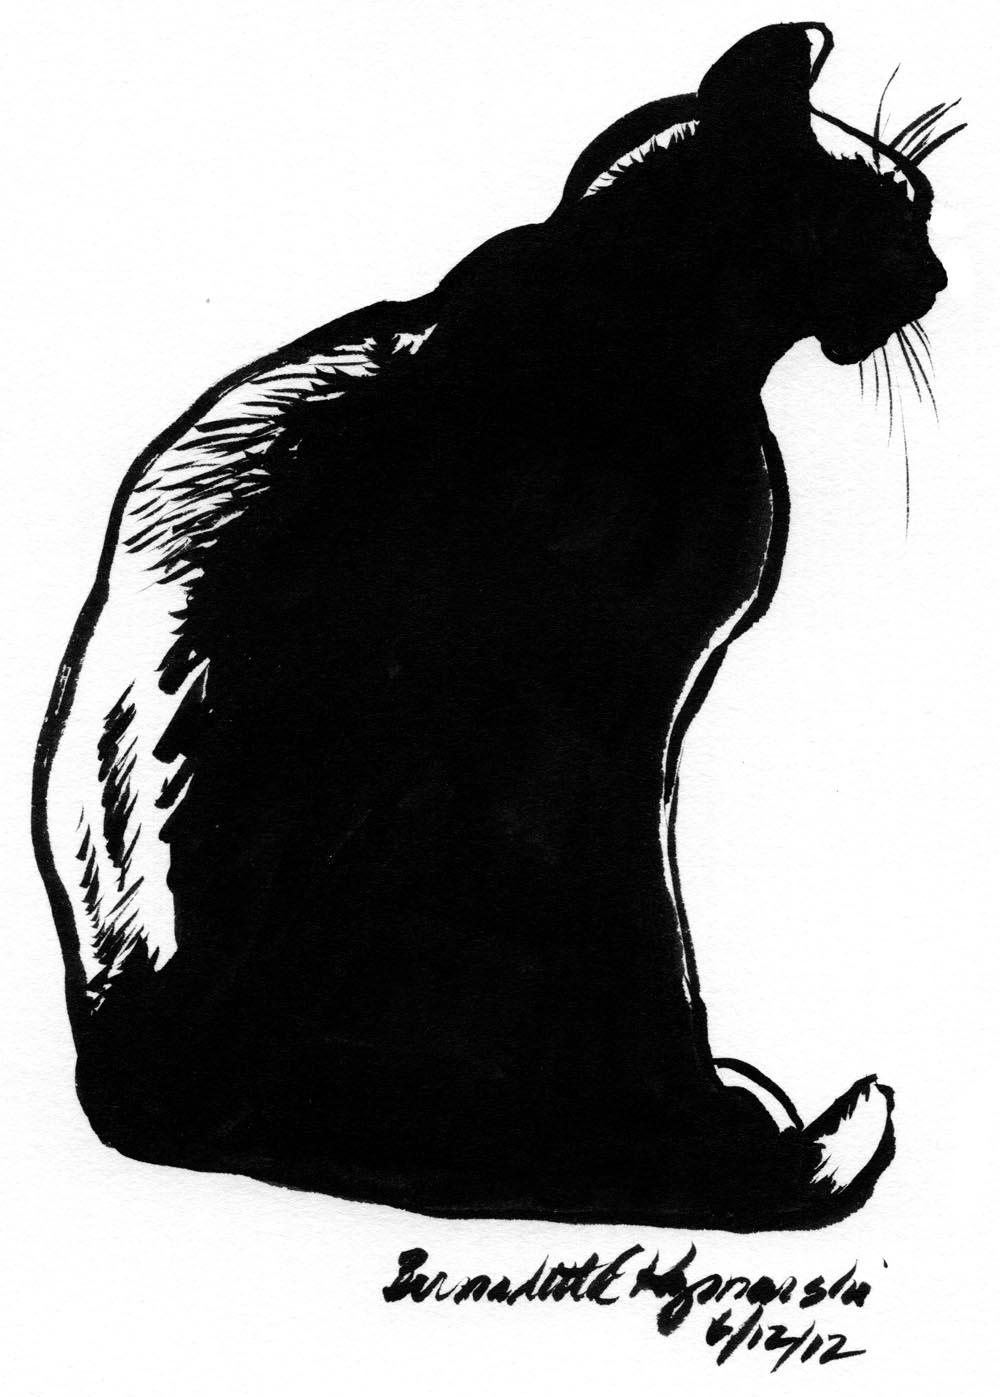 Daily Sketch Reprise: Mimi en Silhouette, 2012